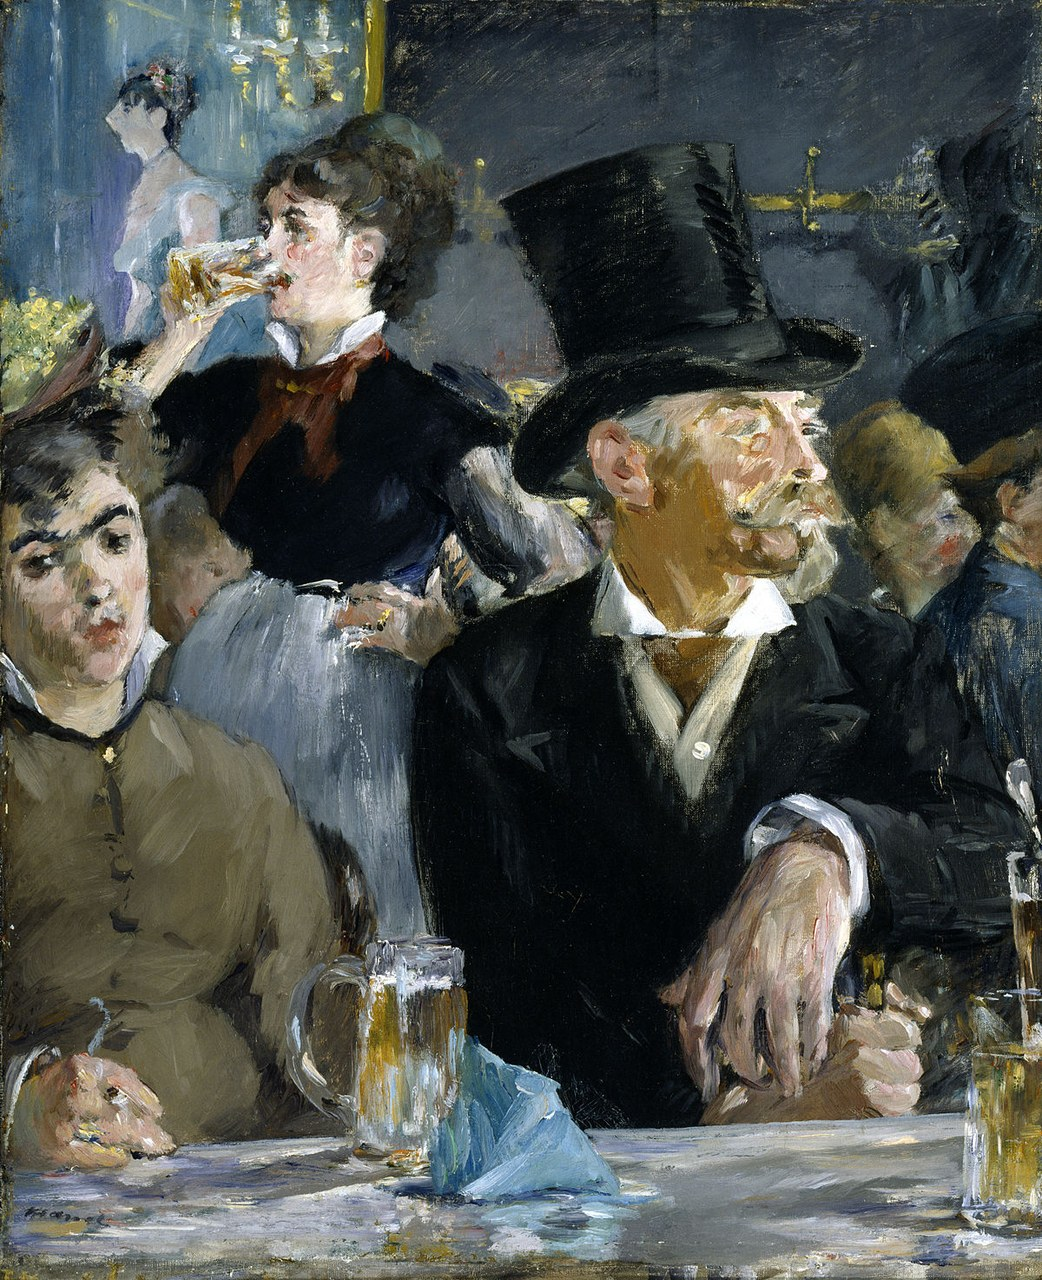 Édouard Manet, Café concert (olio su tela, 1879), The Walters Art Museum, Baltimore